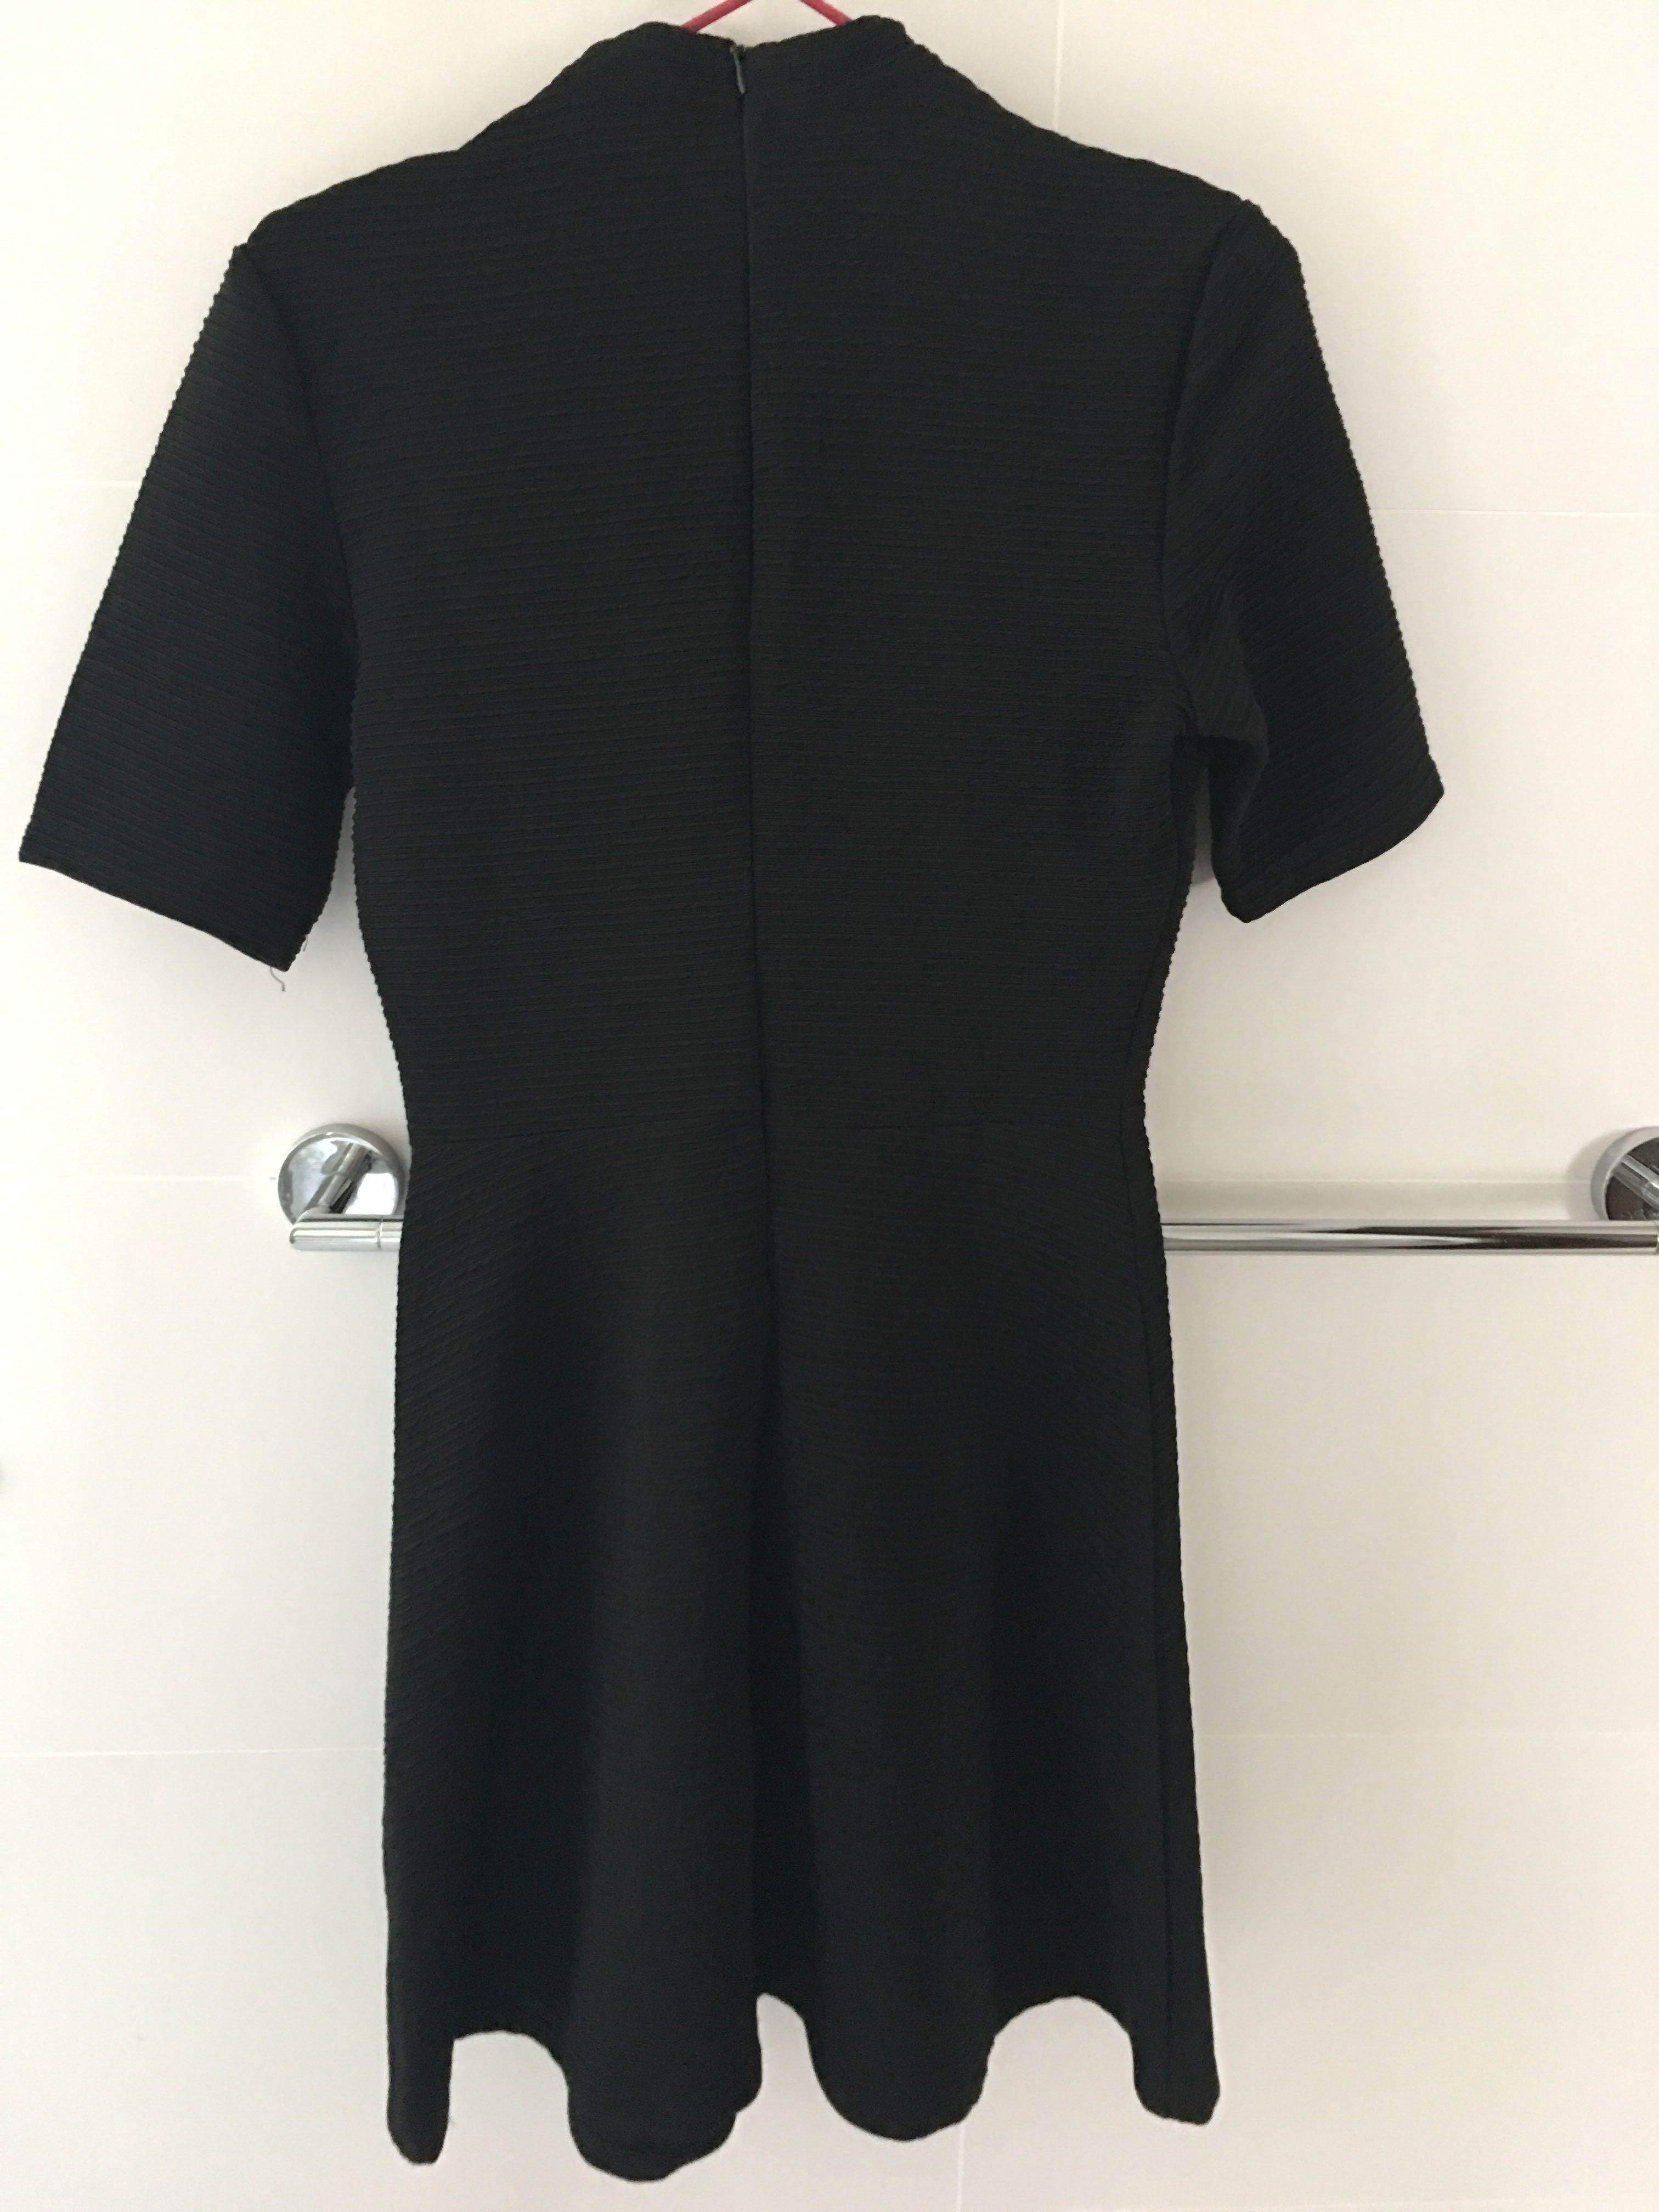 Black Dress round neck office party dress